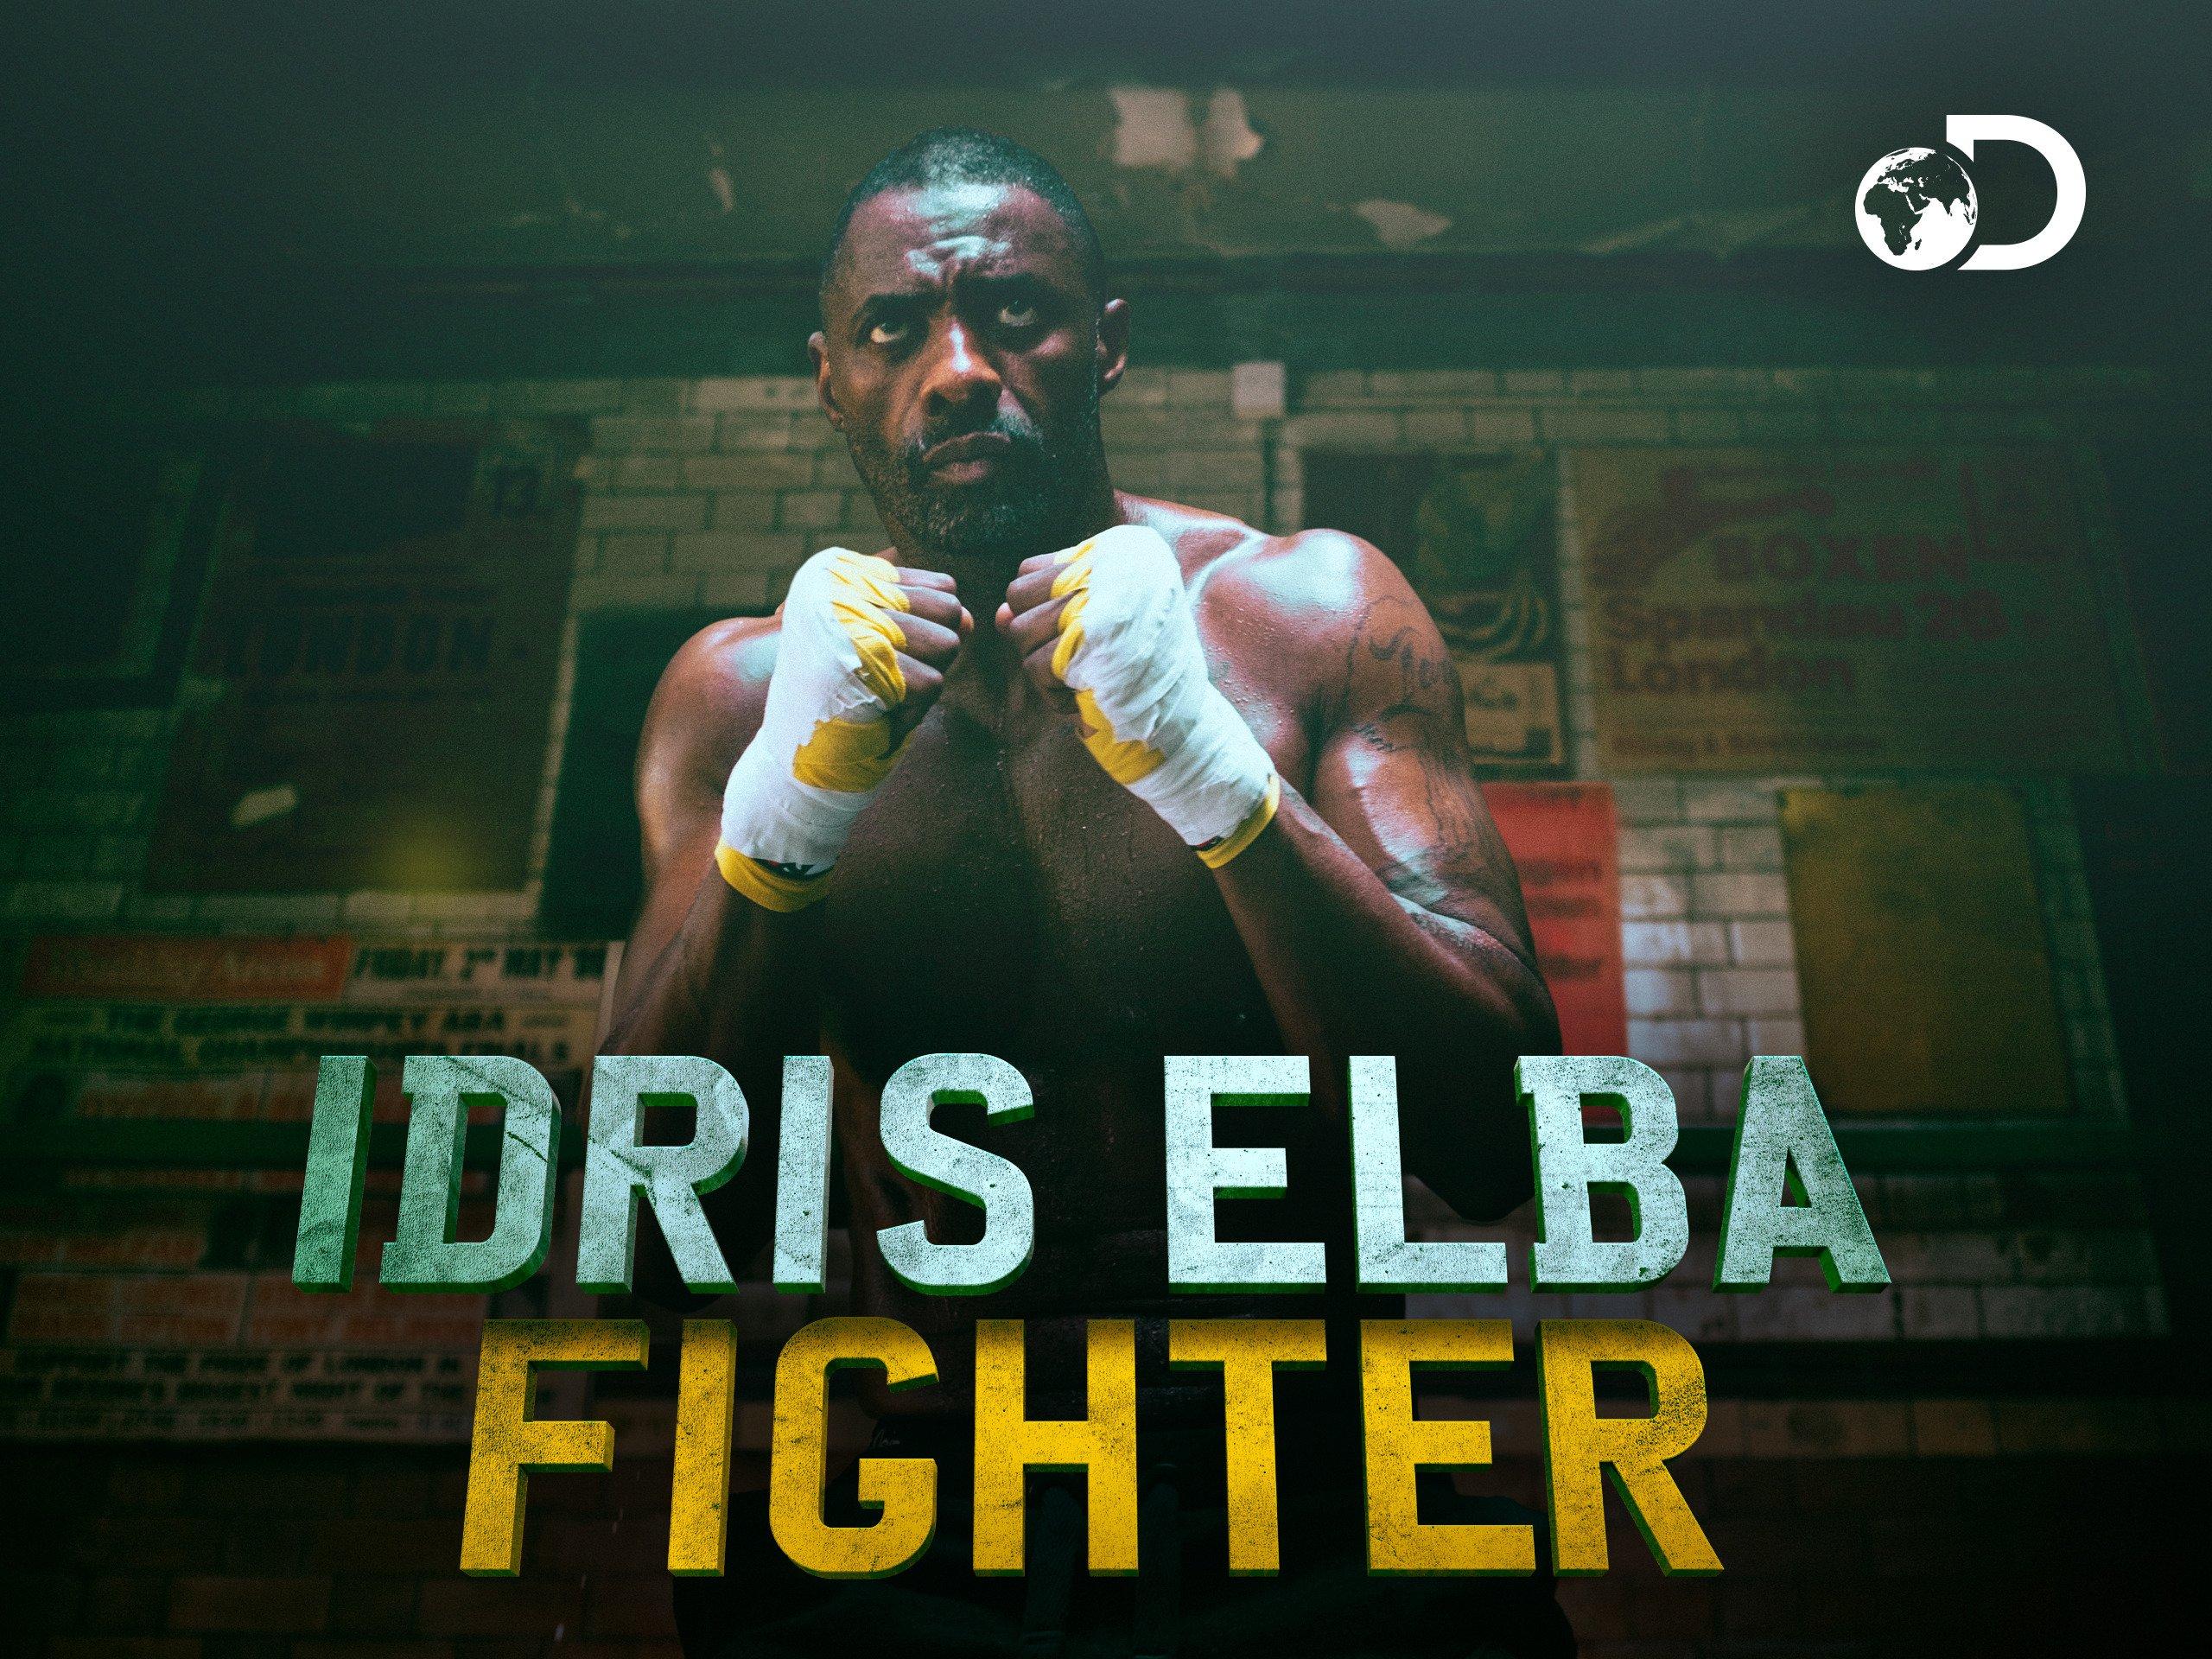 Amazon co uk: Watch Idris Elba Fighter - Season 1 | Prime Video